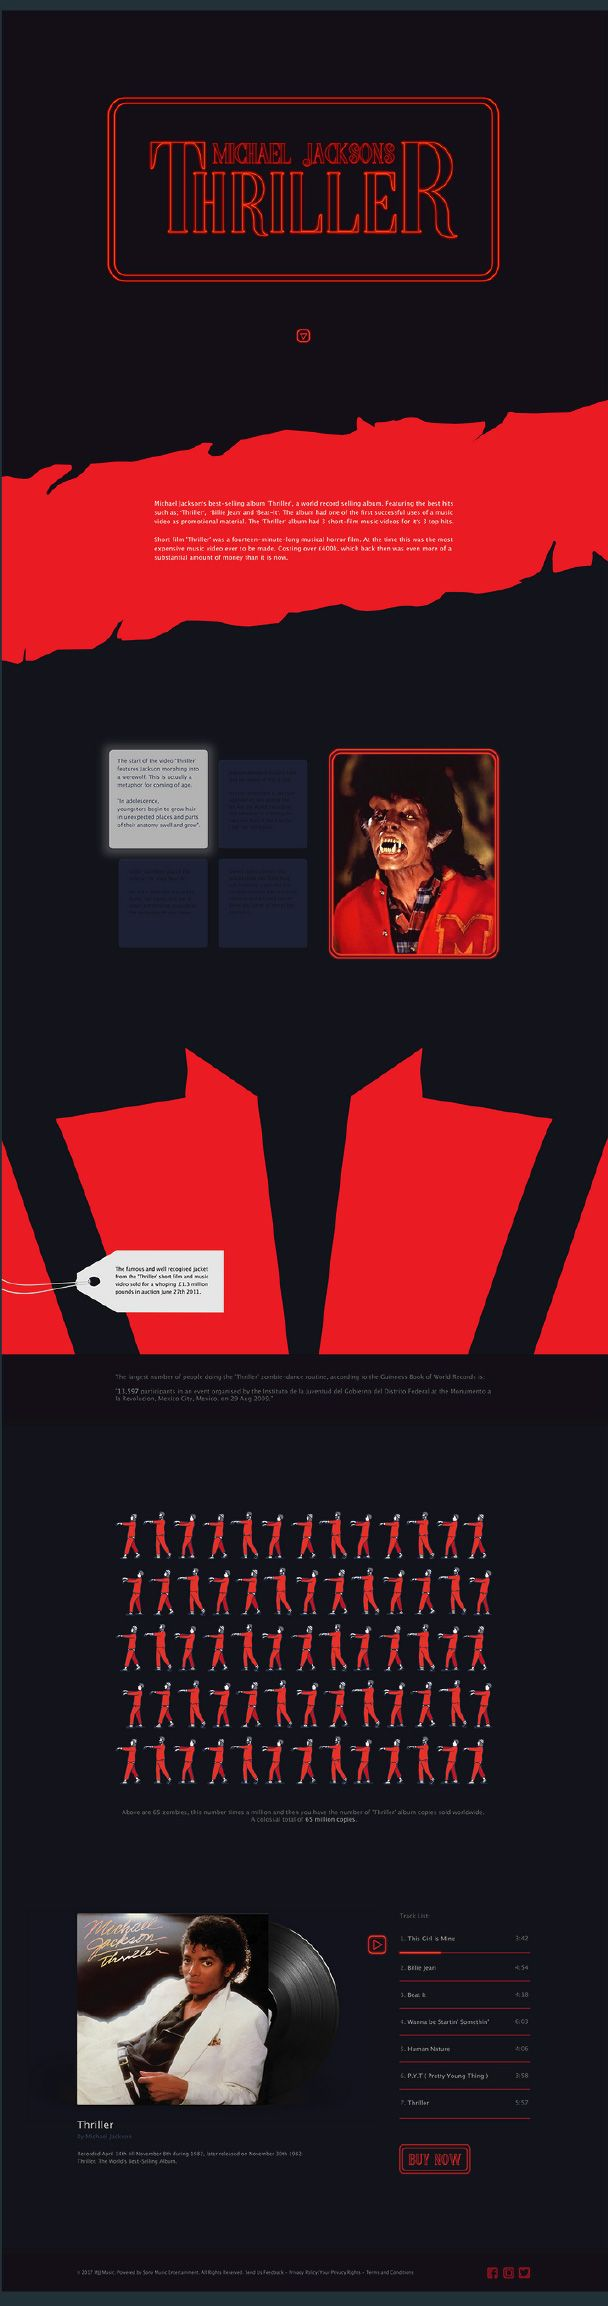 Renee Simonini   Michael Jackson - Thriller   website